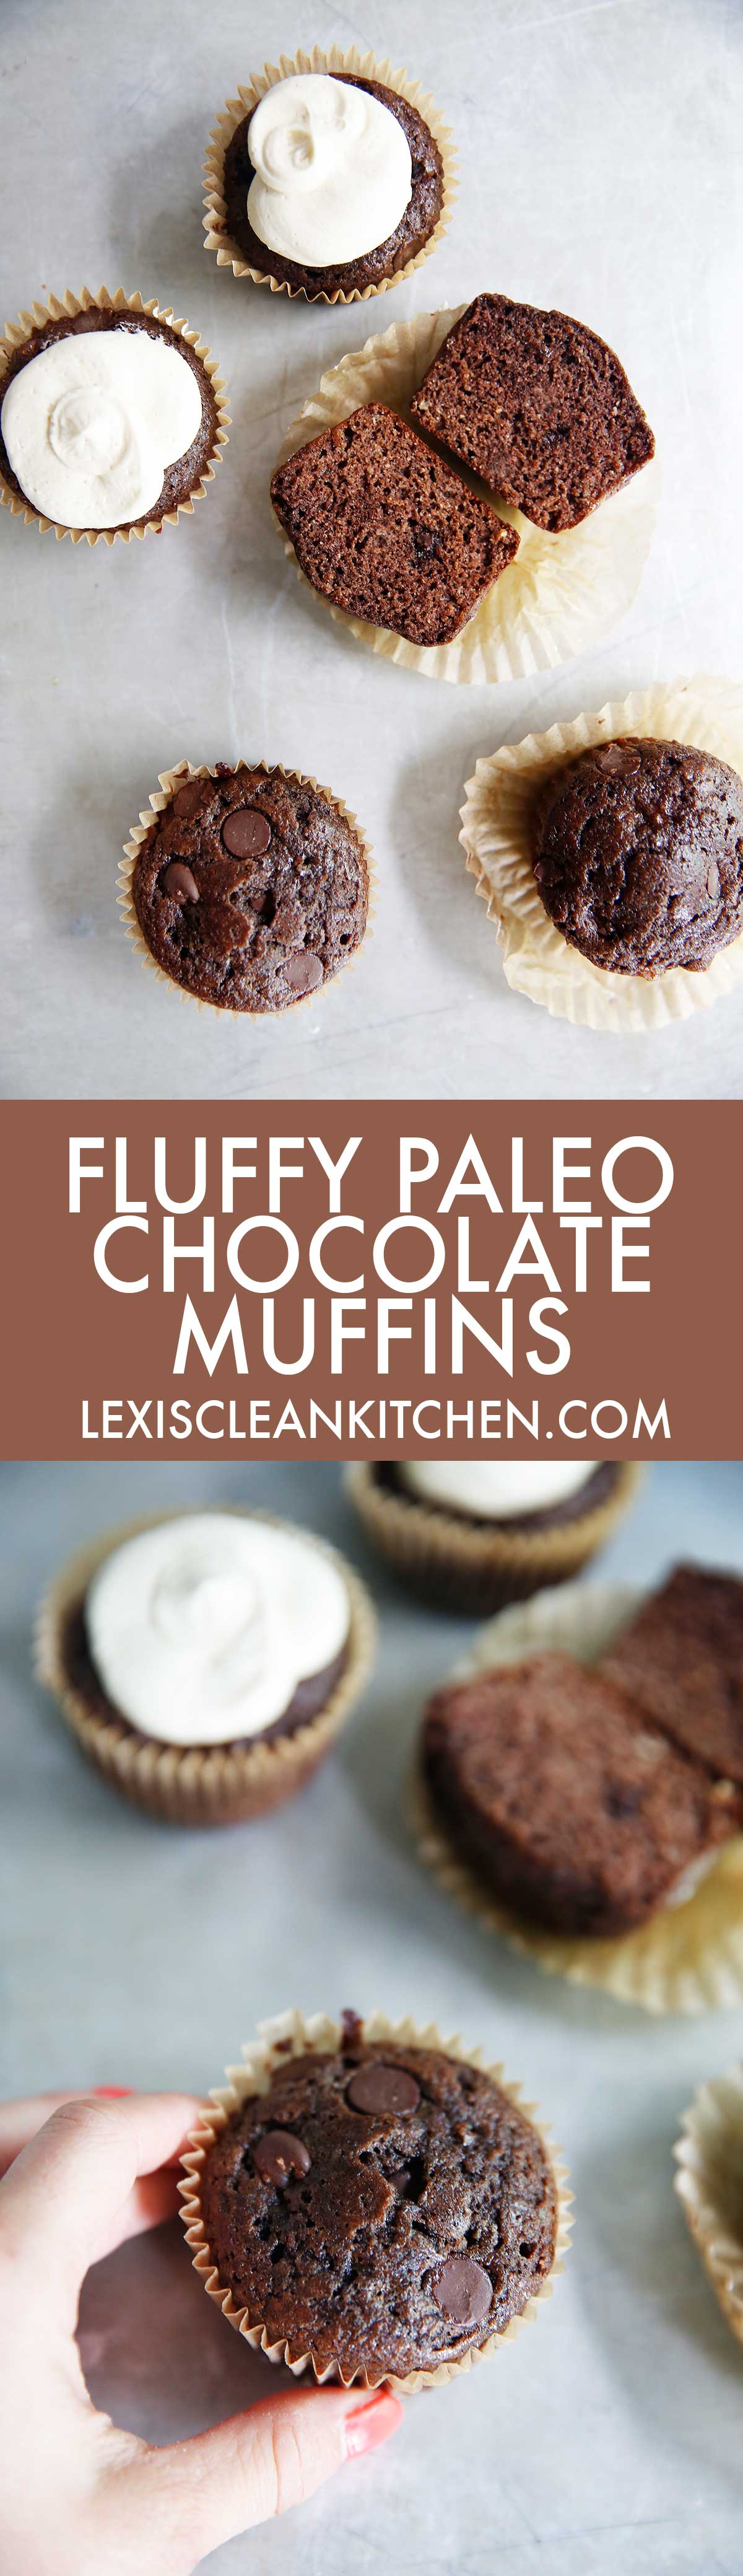 Chocolate Muffins (no refined sugar, grain-free, dairy-free) | Lexi's Clean Kitchen